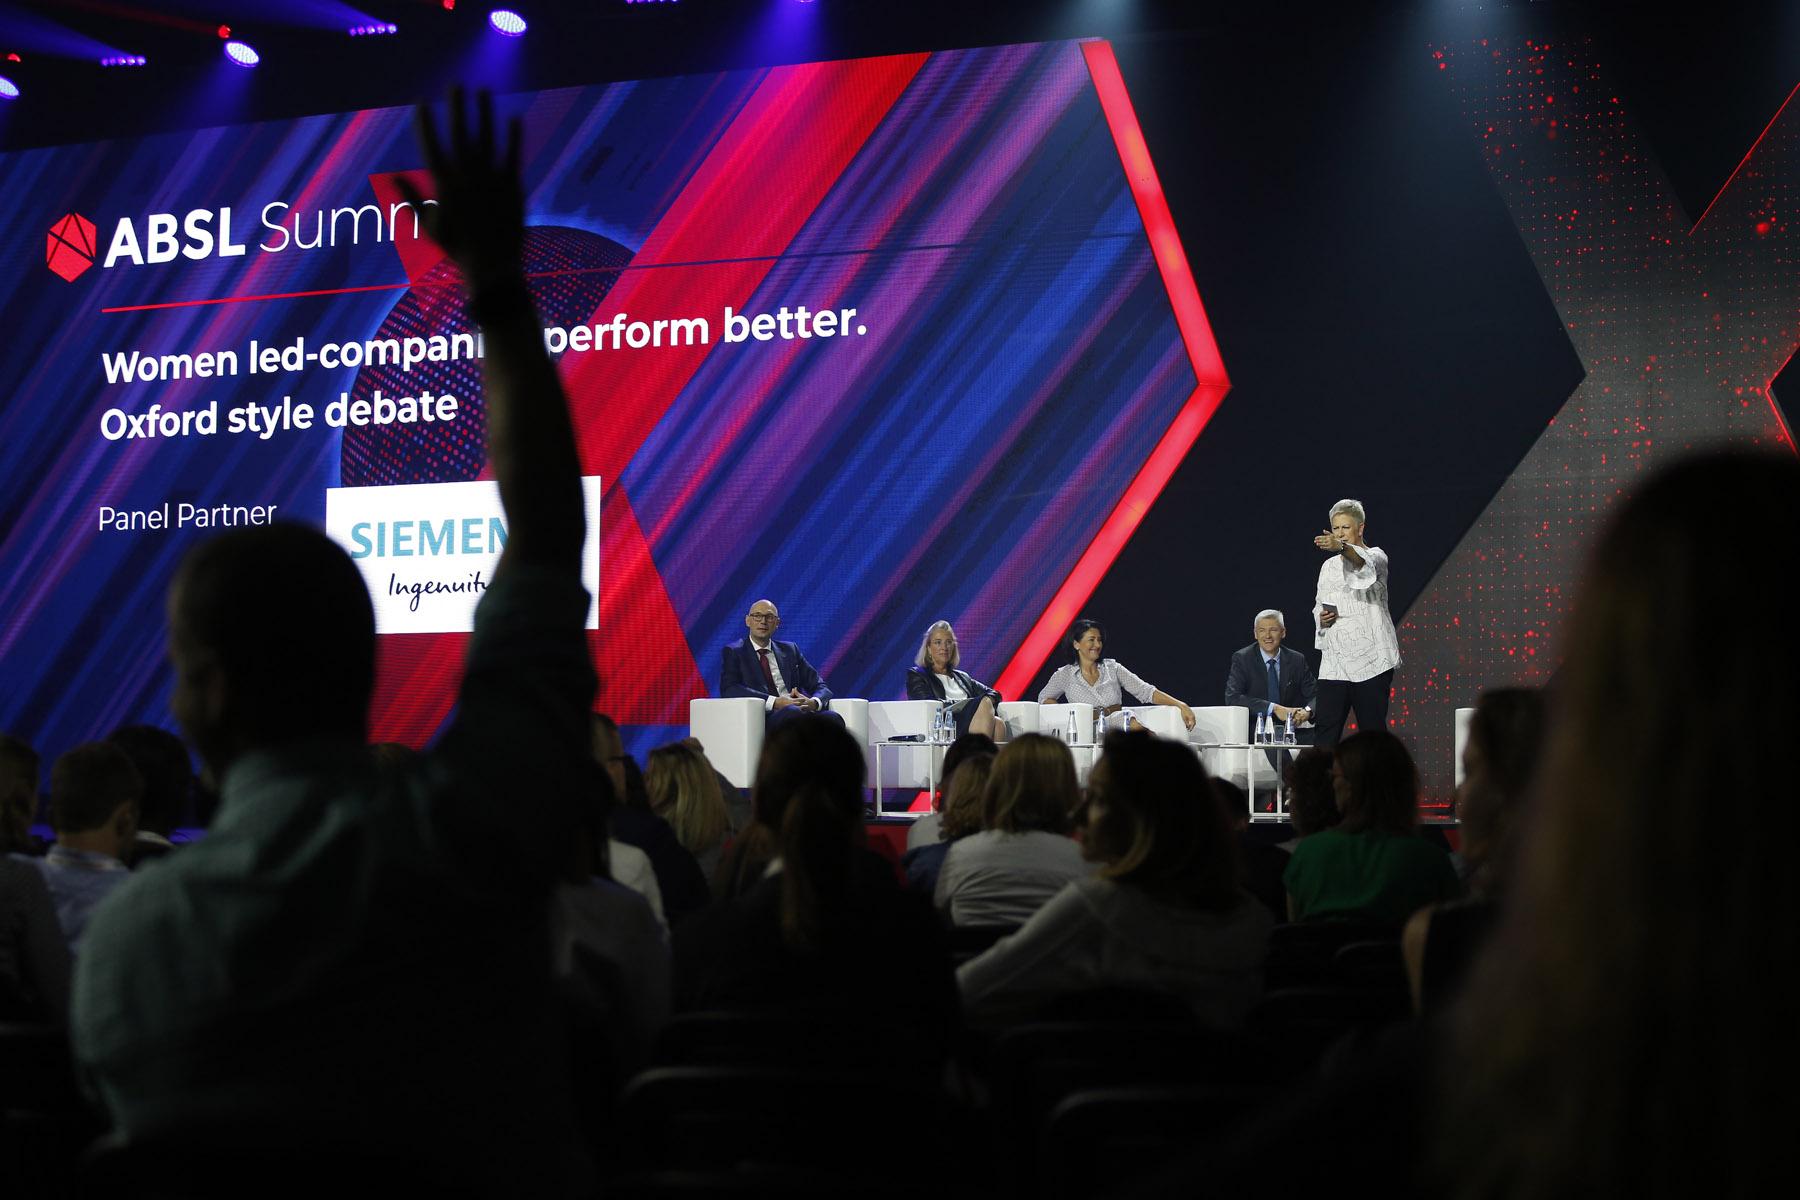 ABSL Summit